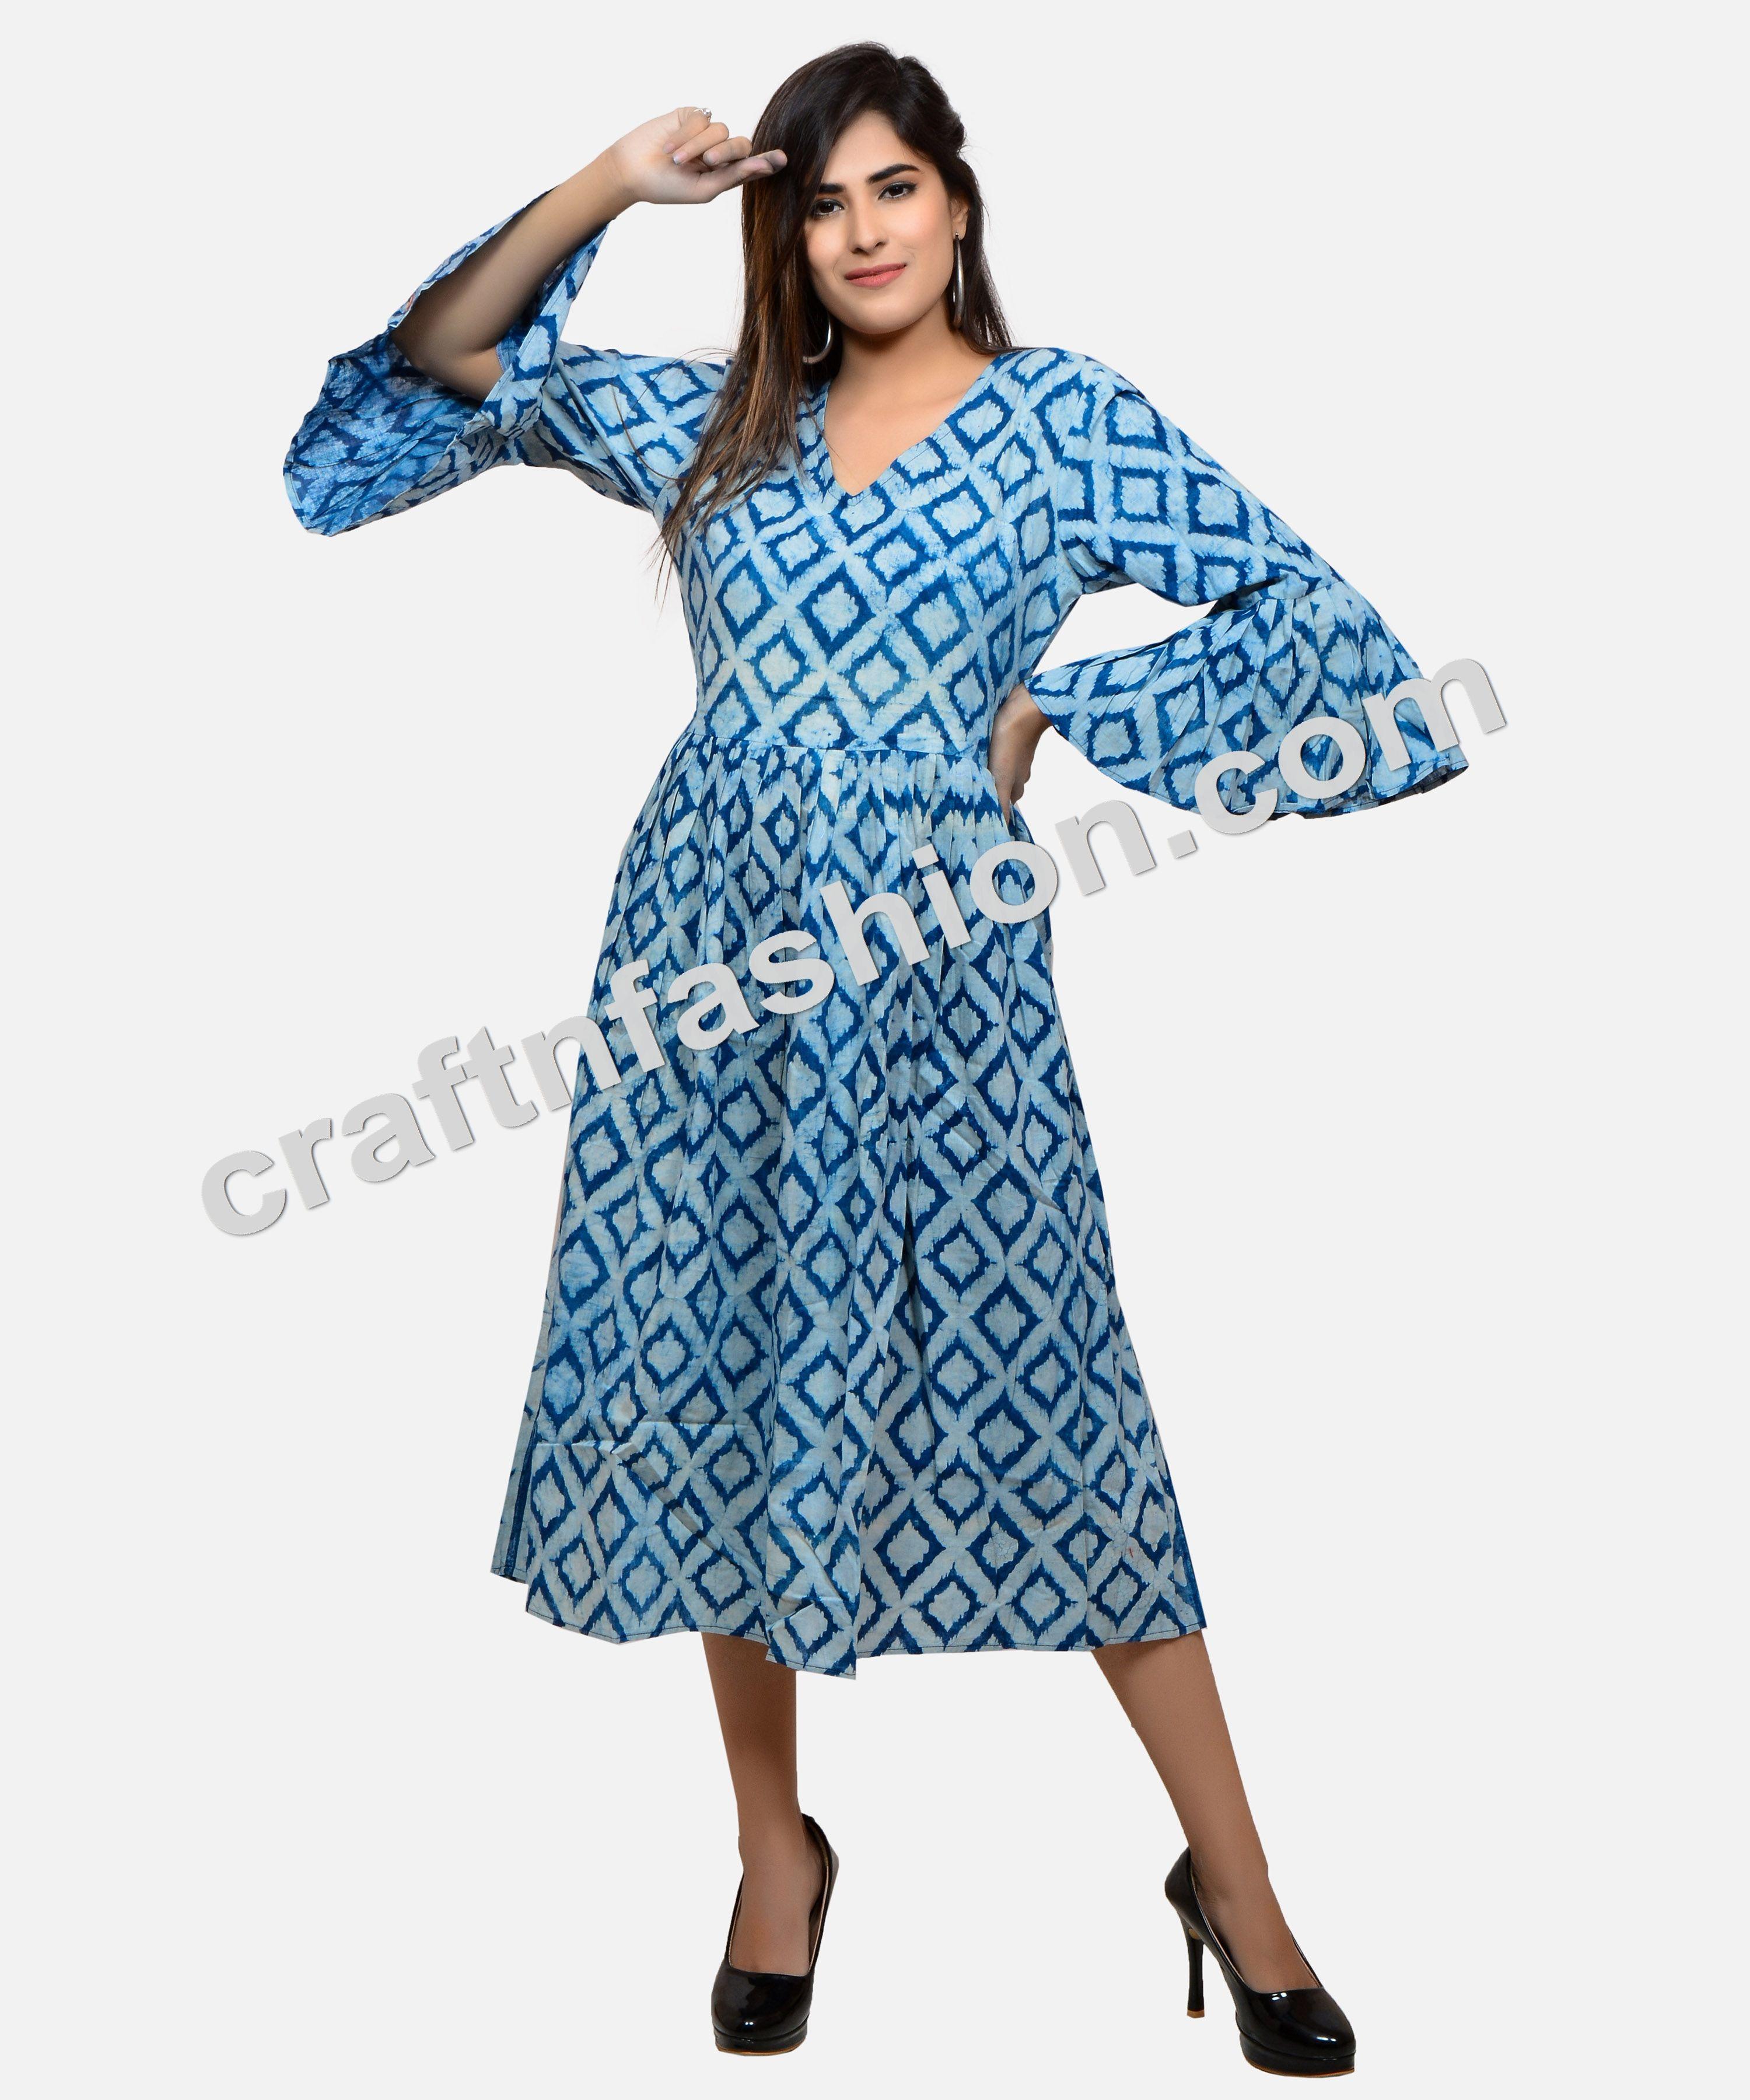 Indian Cotton Hand Block Print Kurti Designerdresses Indigodress Summerwear Umbrellasleeves Hand Indigo Maxi Dress Urban Style Dress Cotton Dress Pattern [ 3600 x 3000 Pixel ]